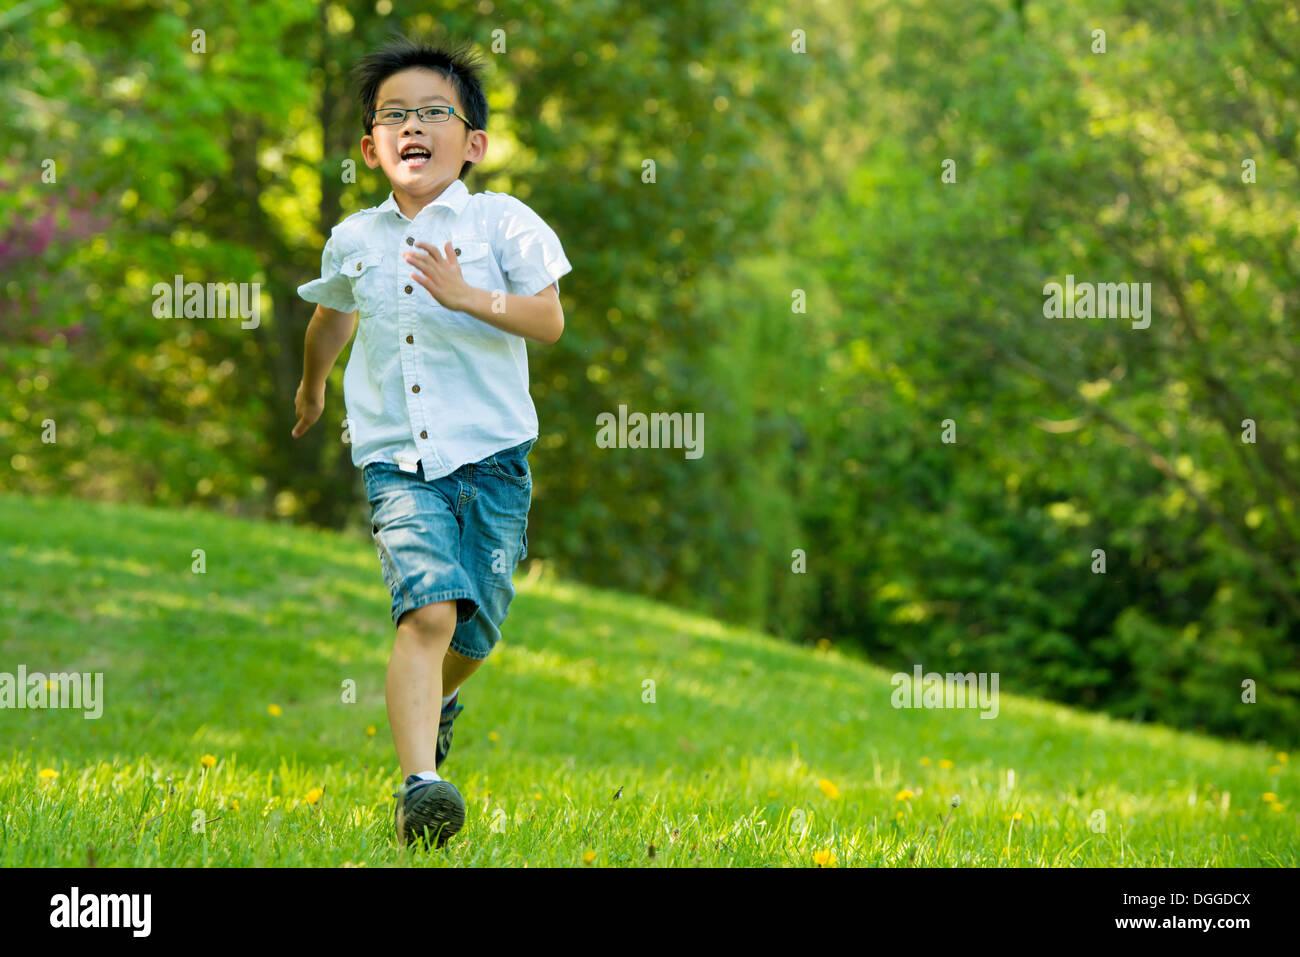 Boy running on grass - Stock Image